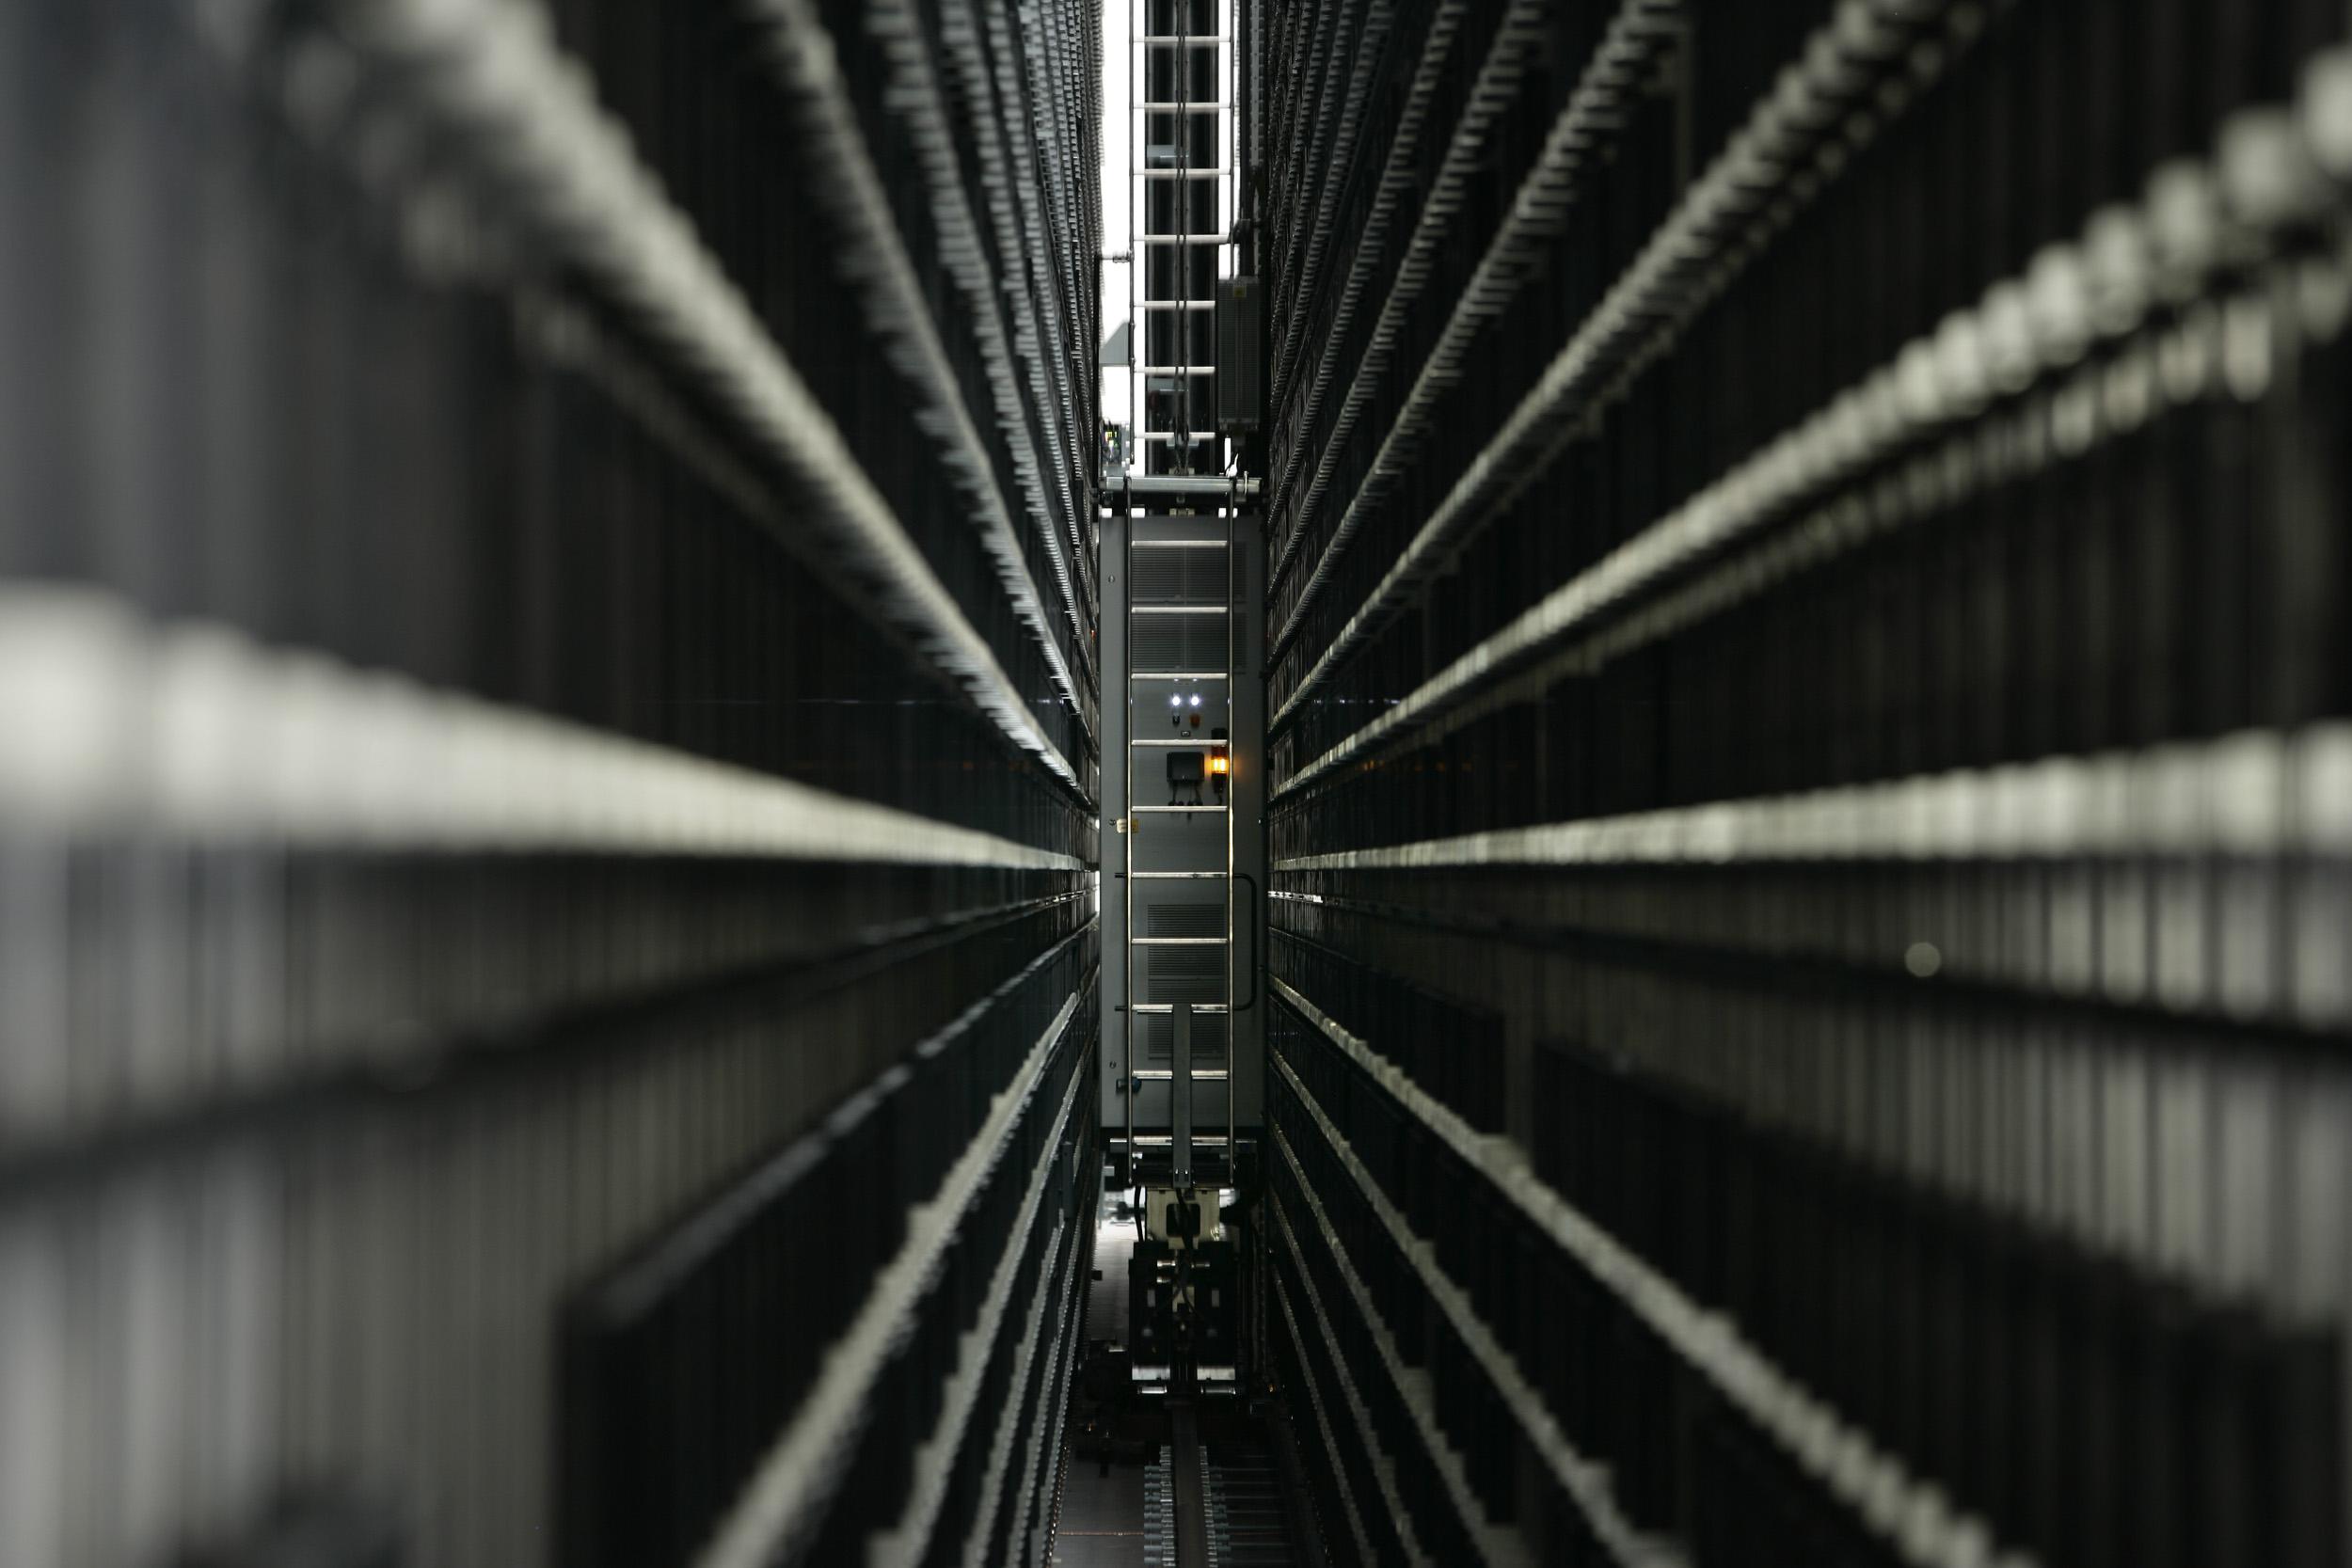 Automation_18.JPG